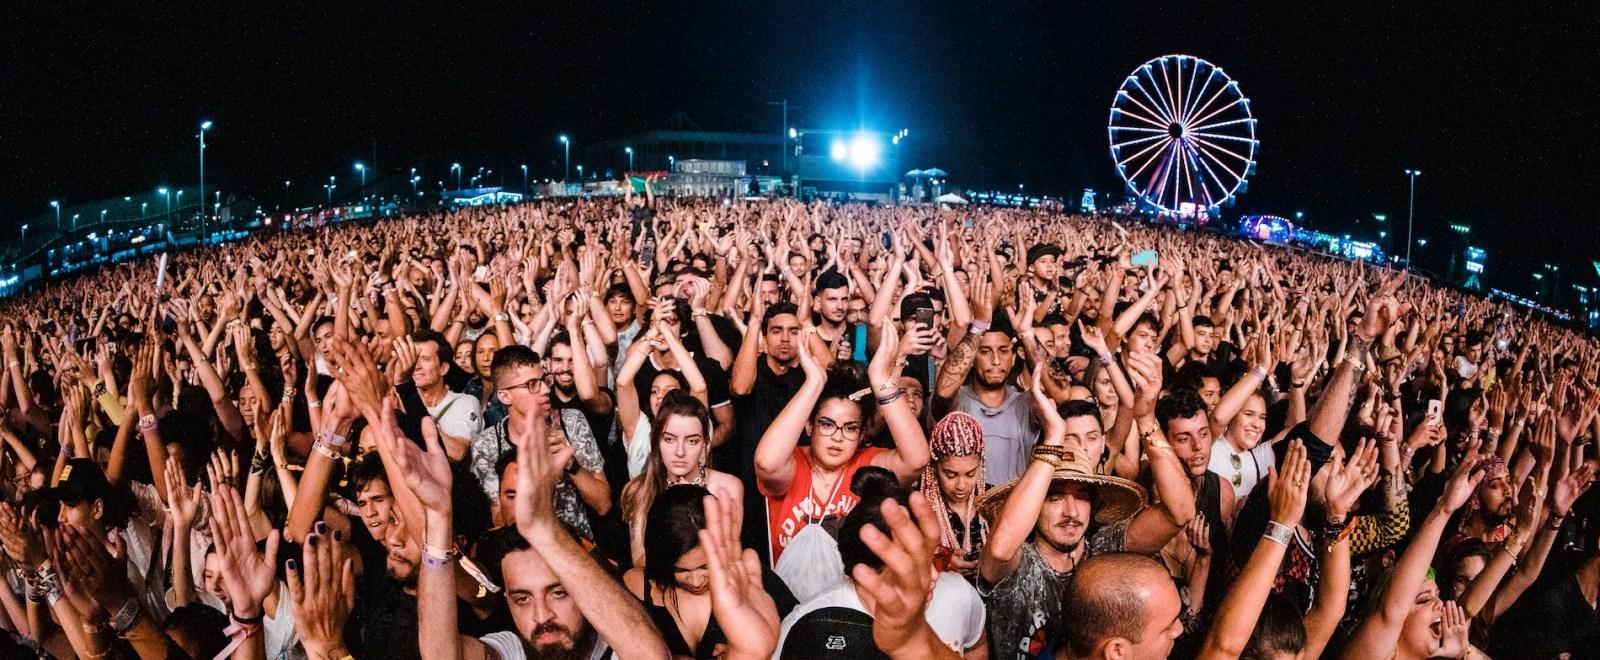 music-festival-crowd-audience-rock-in-rio-getty-full.jpg